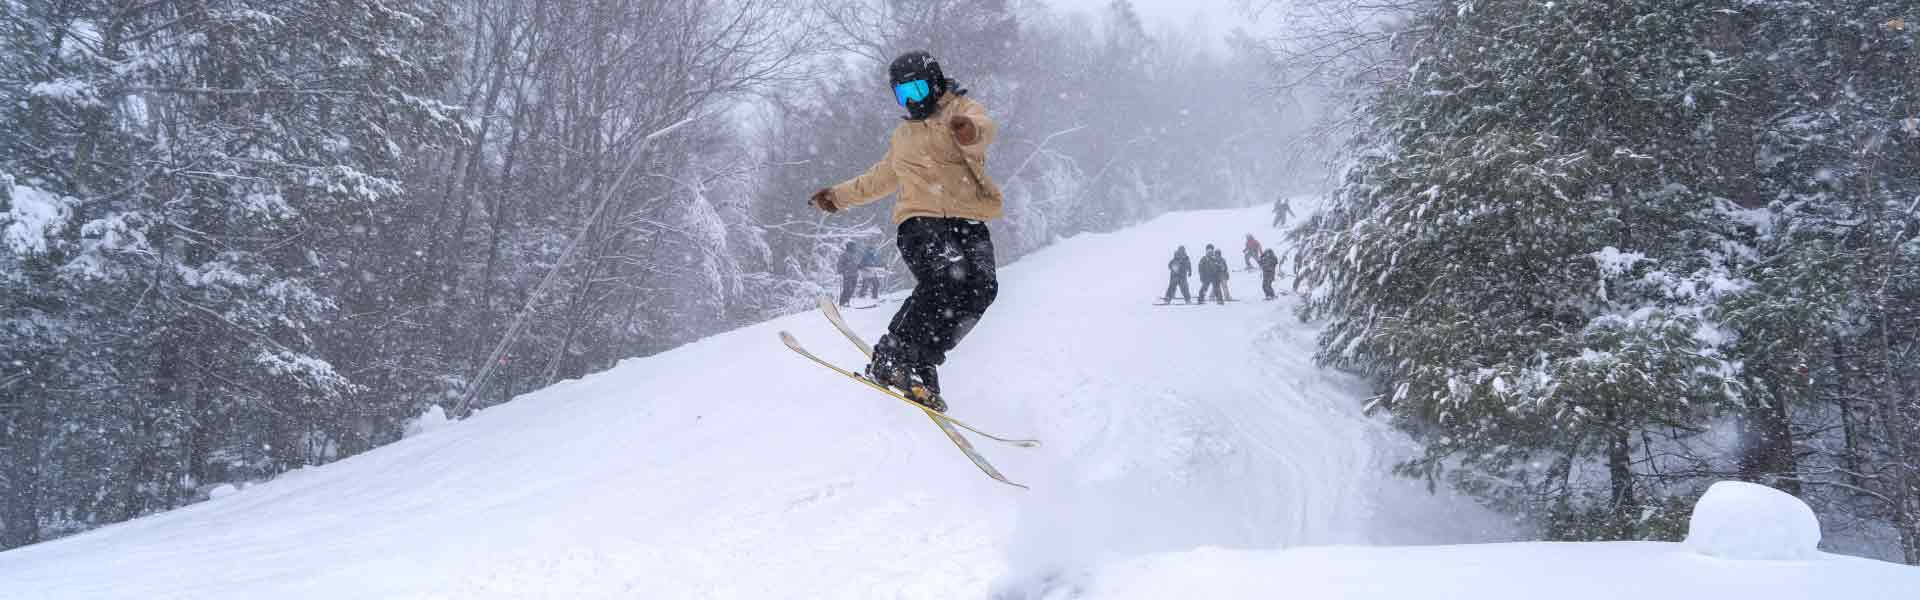 Skier jumping in terrain park